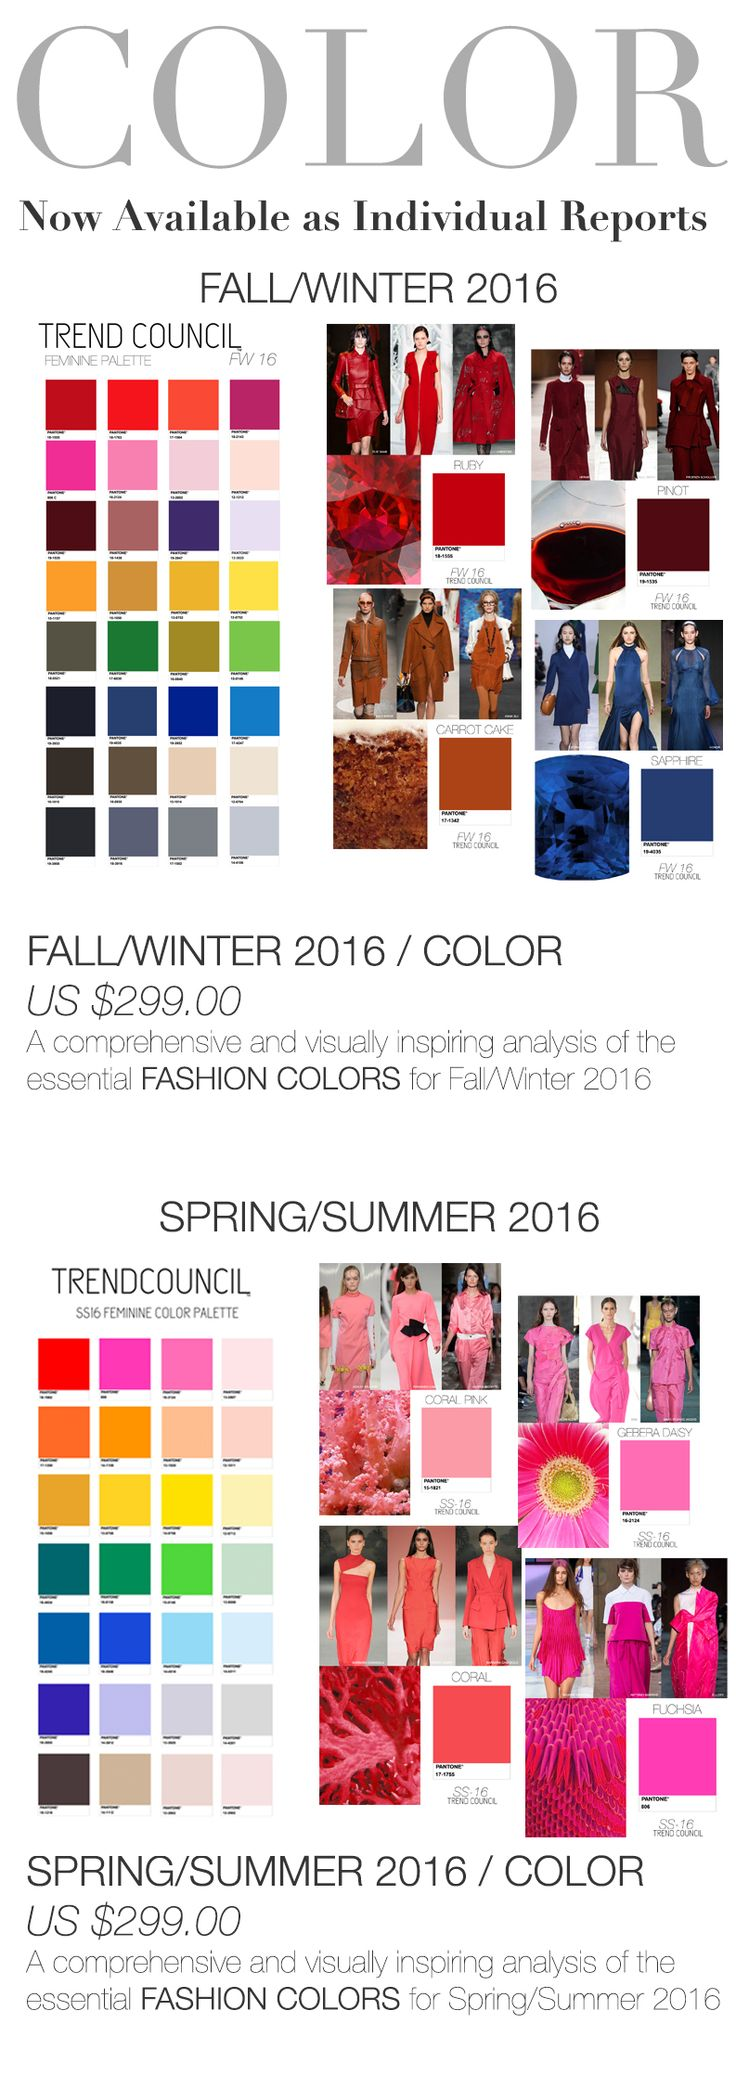 17 best images about spring summer 2016 color on pinterest pantone color fashion trends and. Black Bedroom Furniture Sets. Home Design Ideas